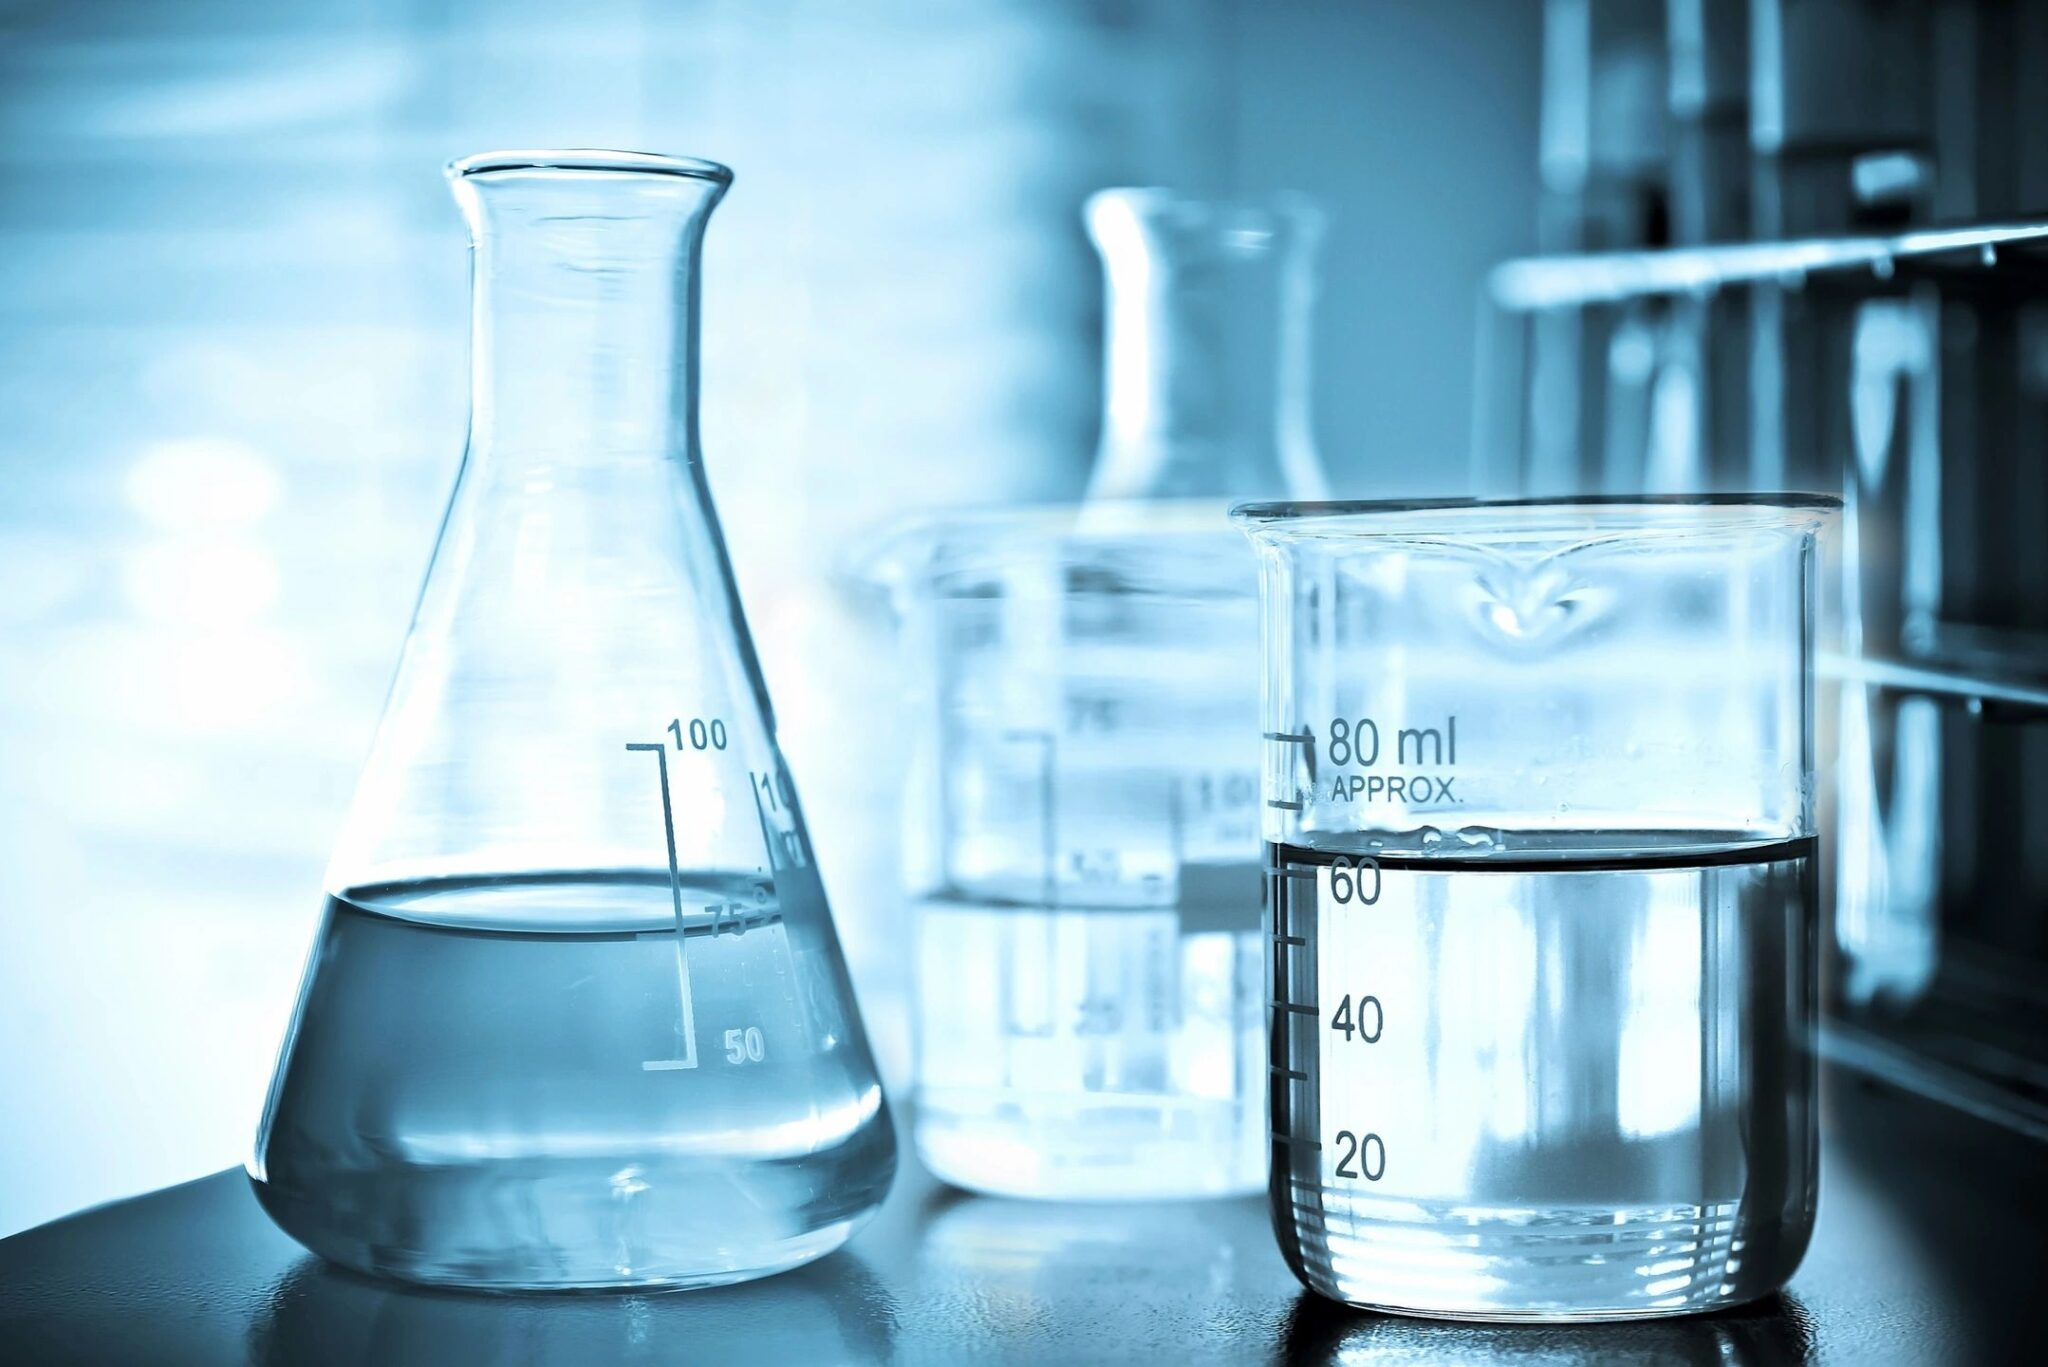 failed experiments move science forward